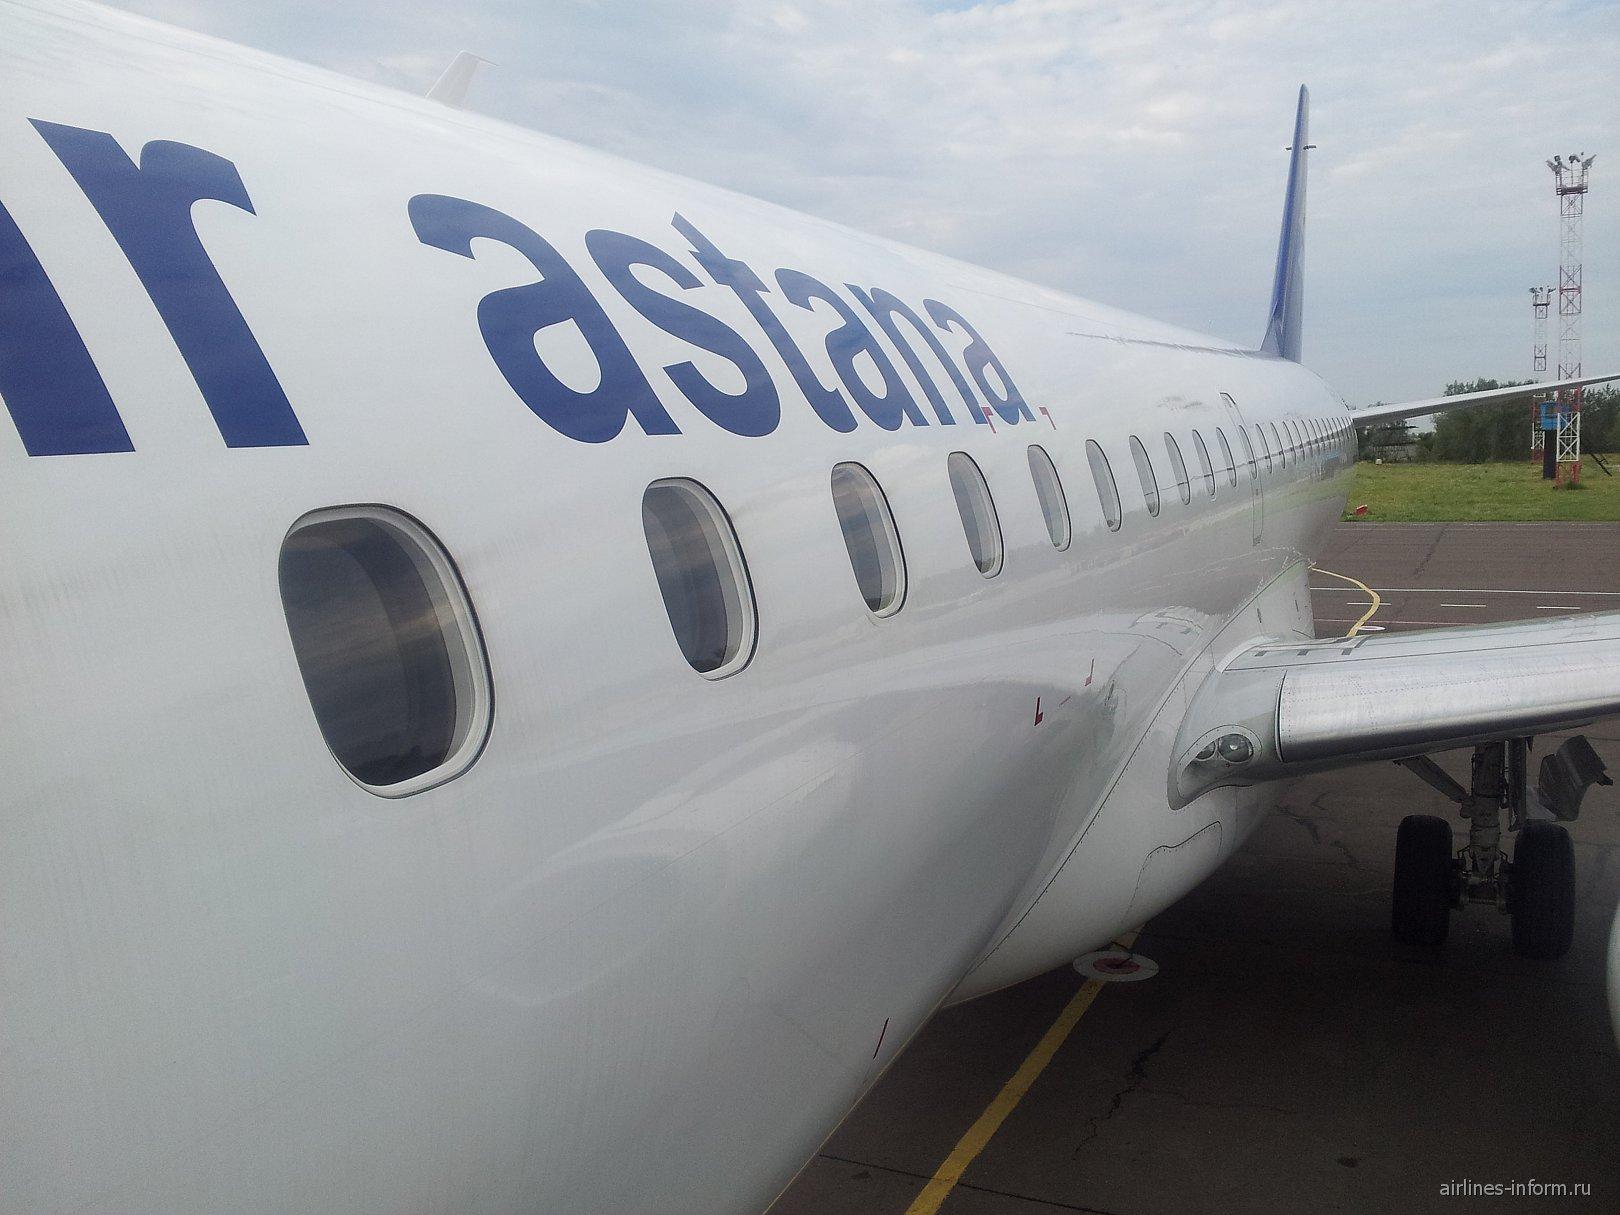 Embraer 190 авиакомпании Air Astana